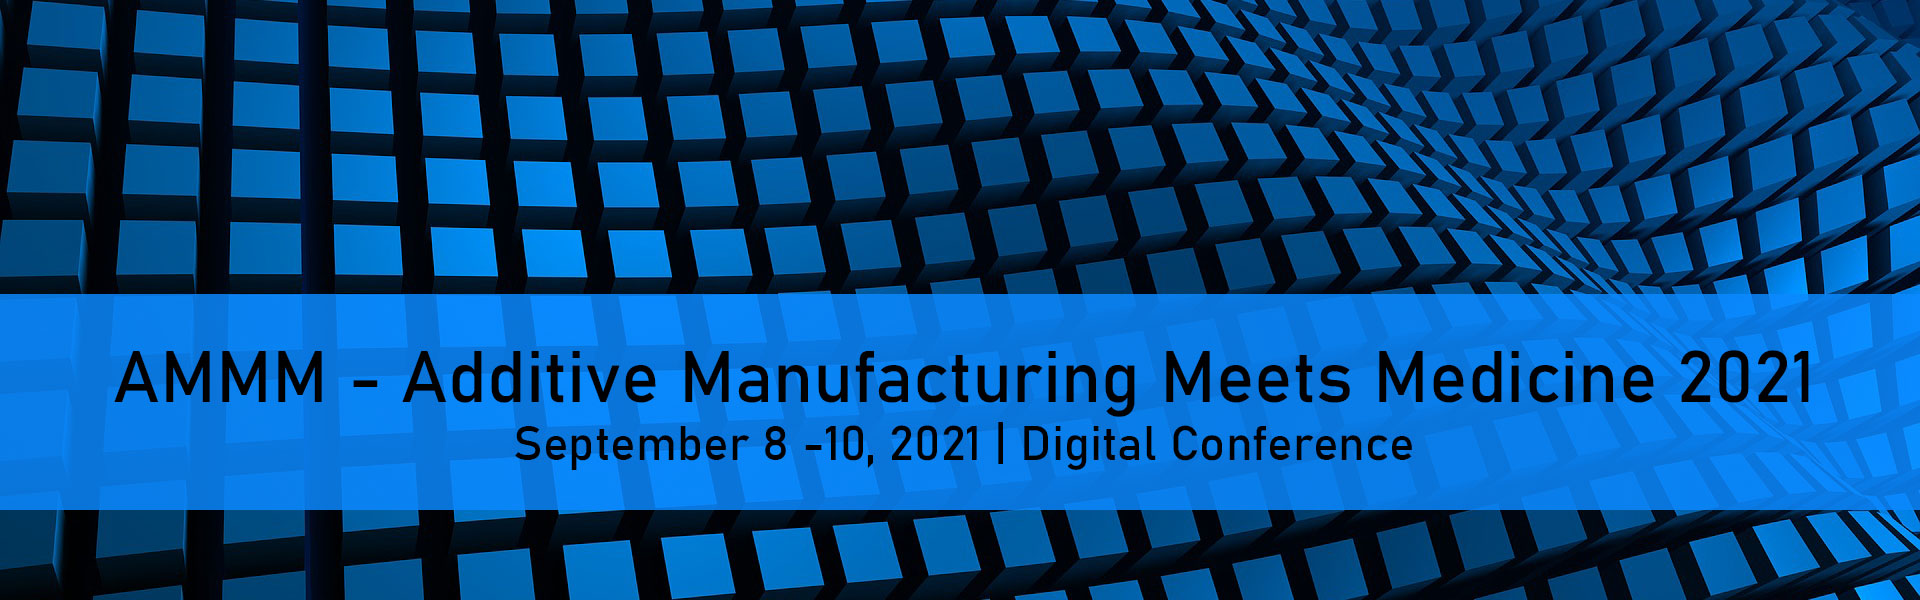 AMMM - Additive Manufacturing Meets Medicine 2021 @ digital